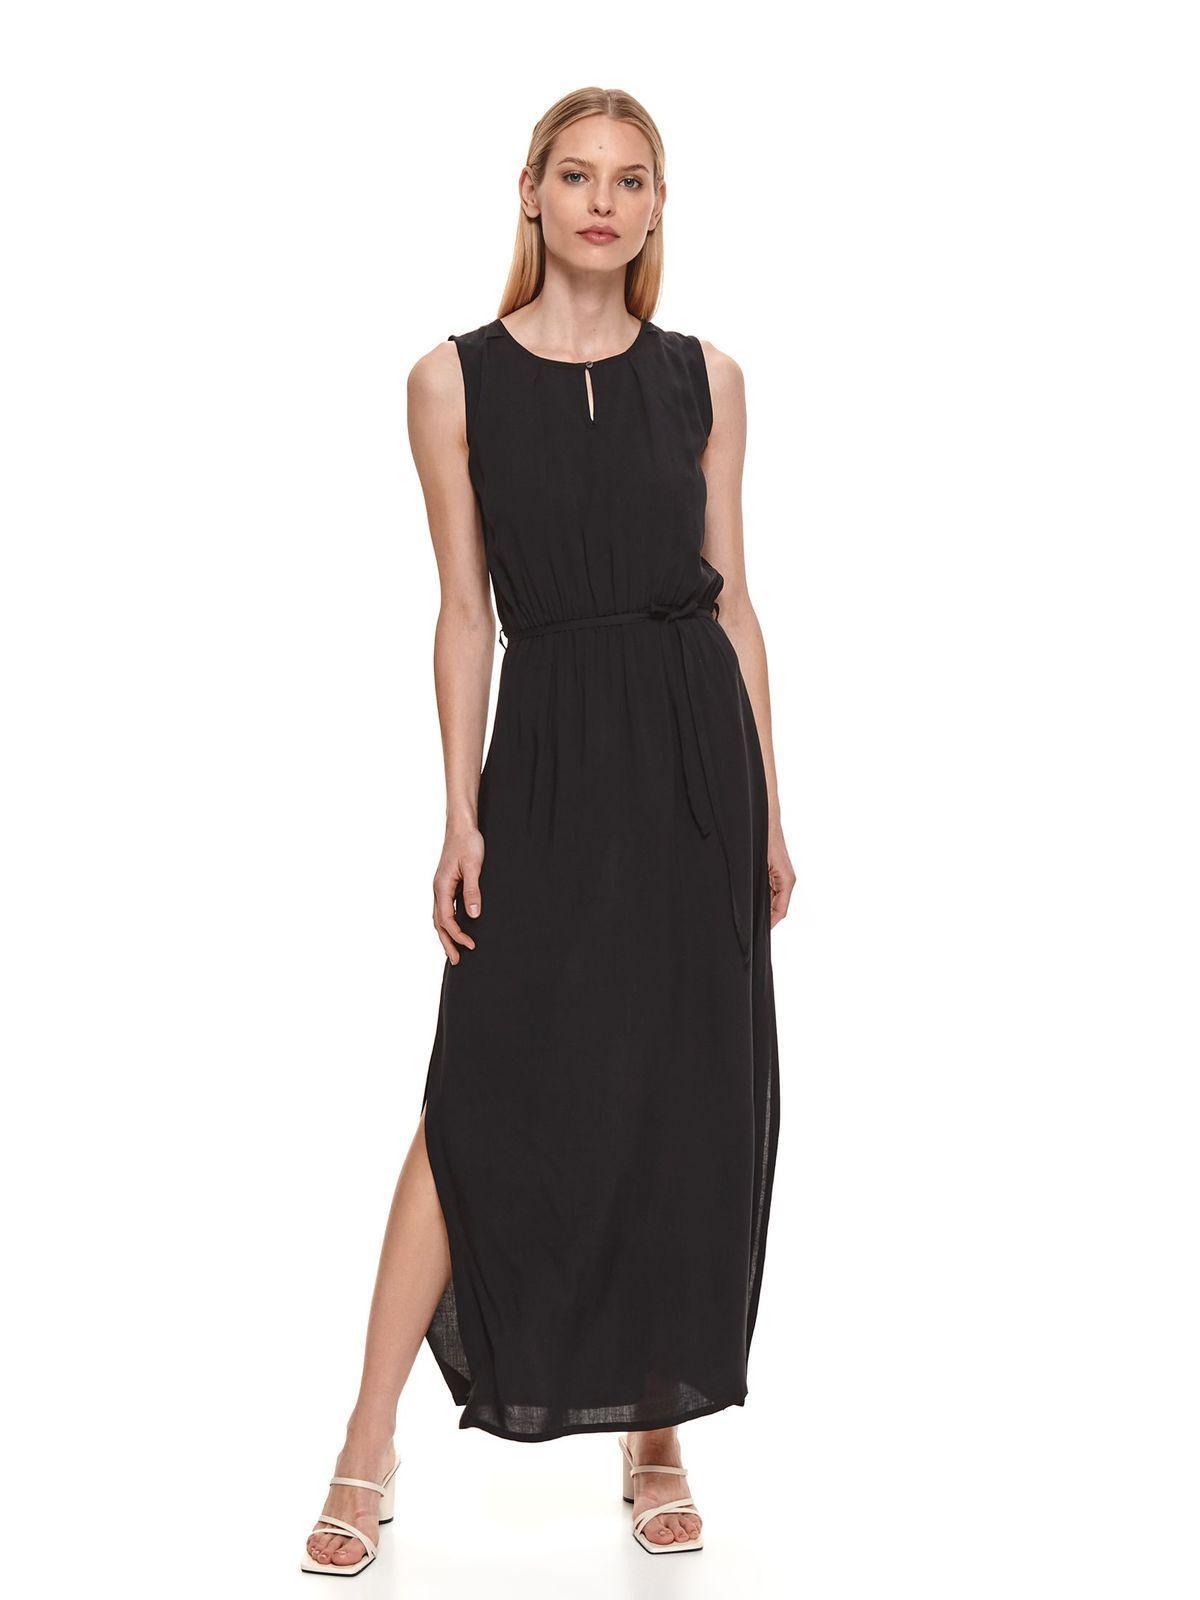 Hosszú fekete ujjatlan derékban zsinóros casual harang ruha